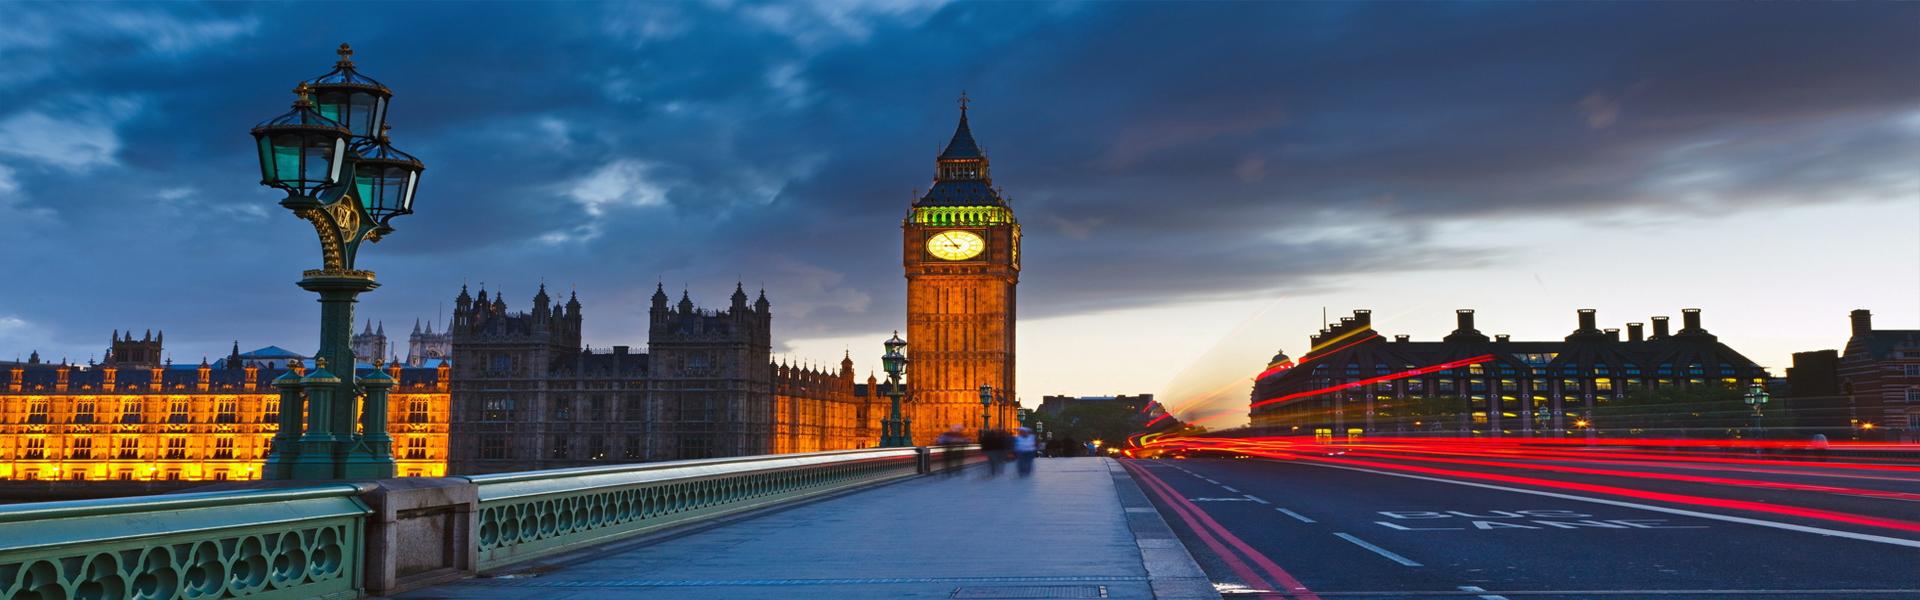 GWP Londen: Dagboek